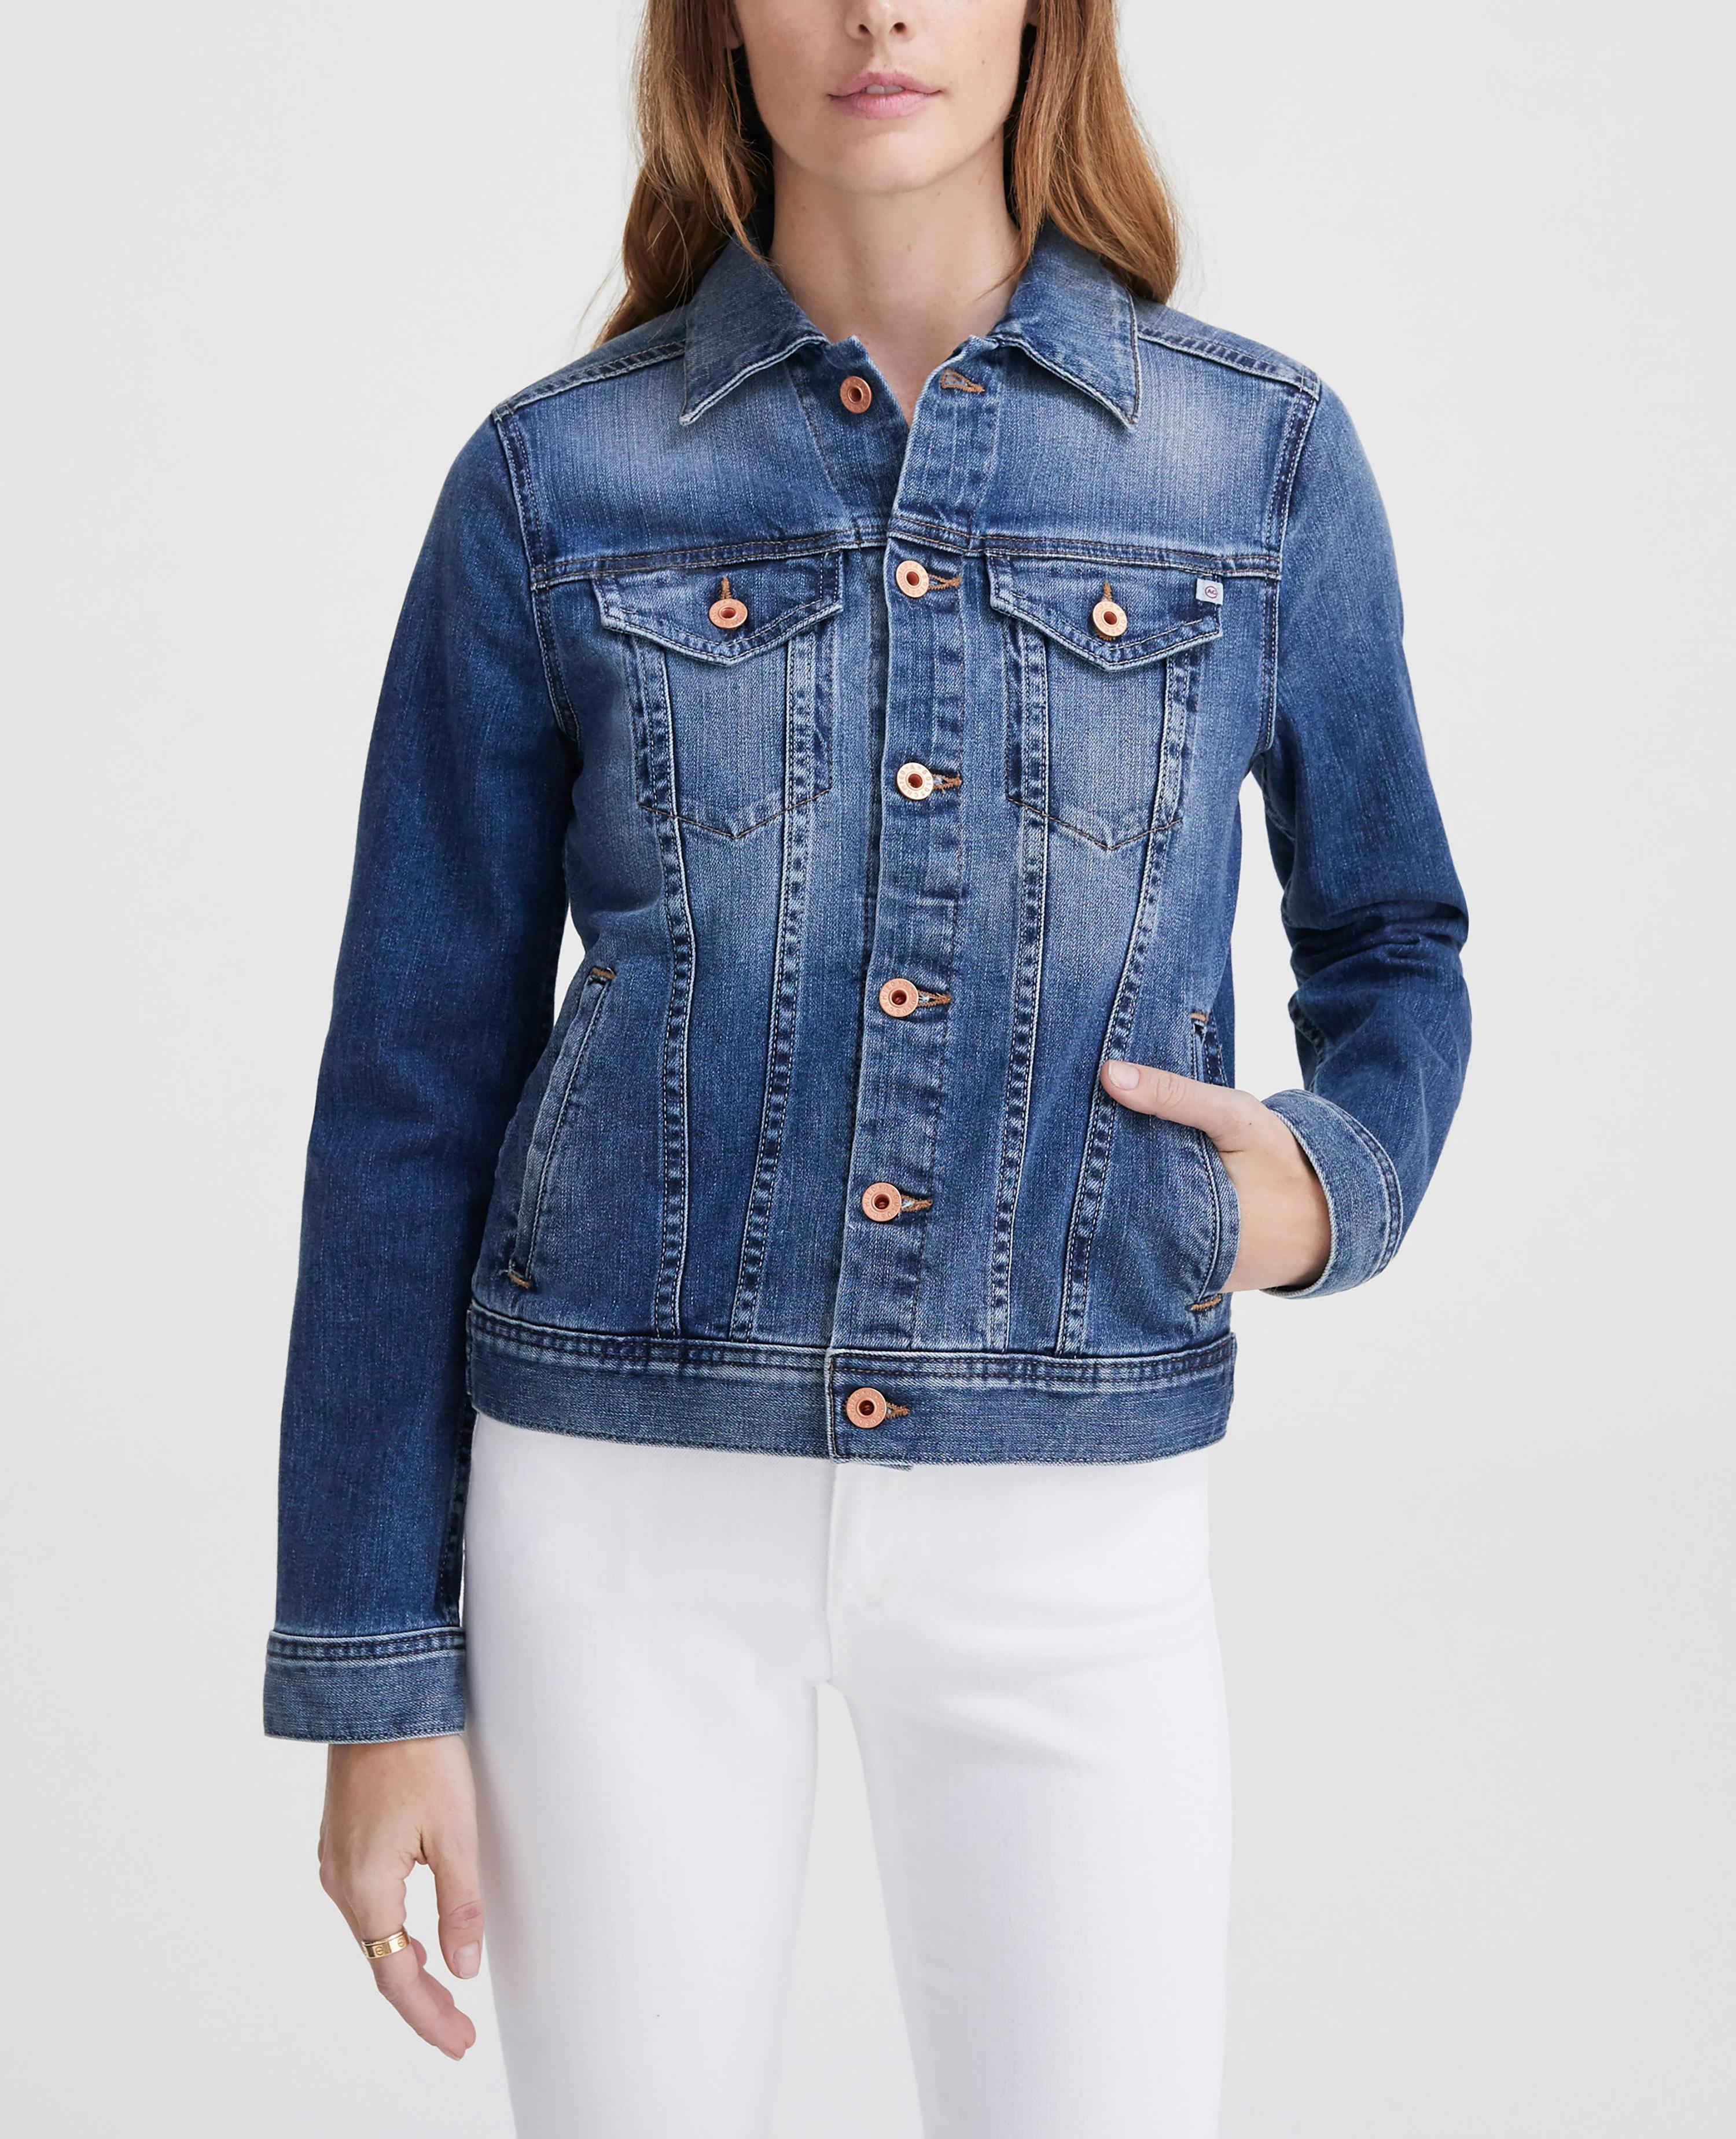 The Mya Jacket